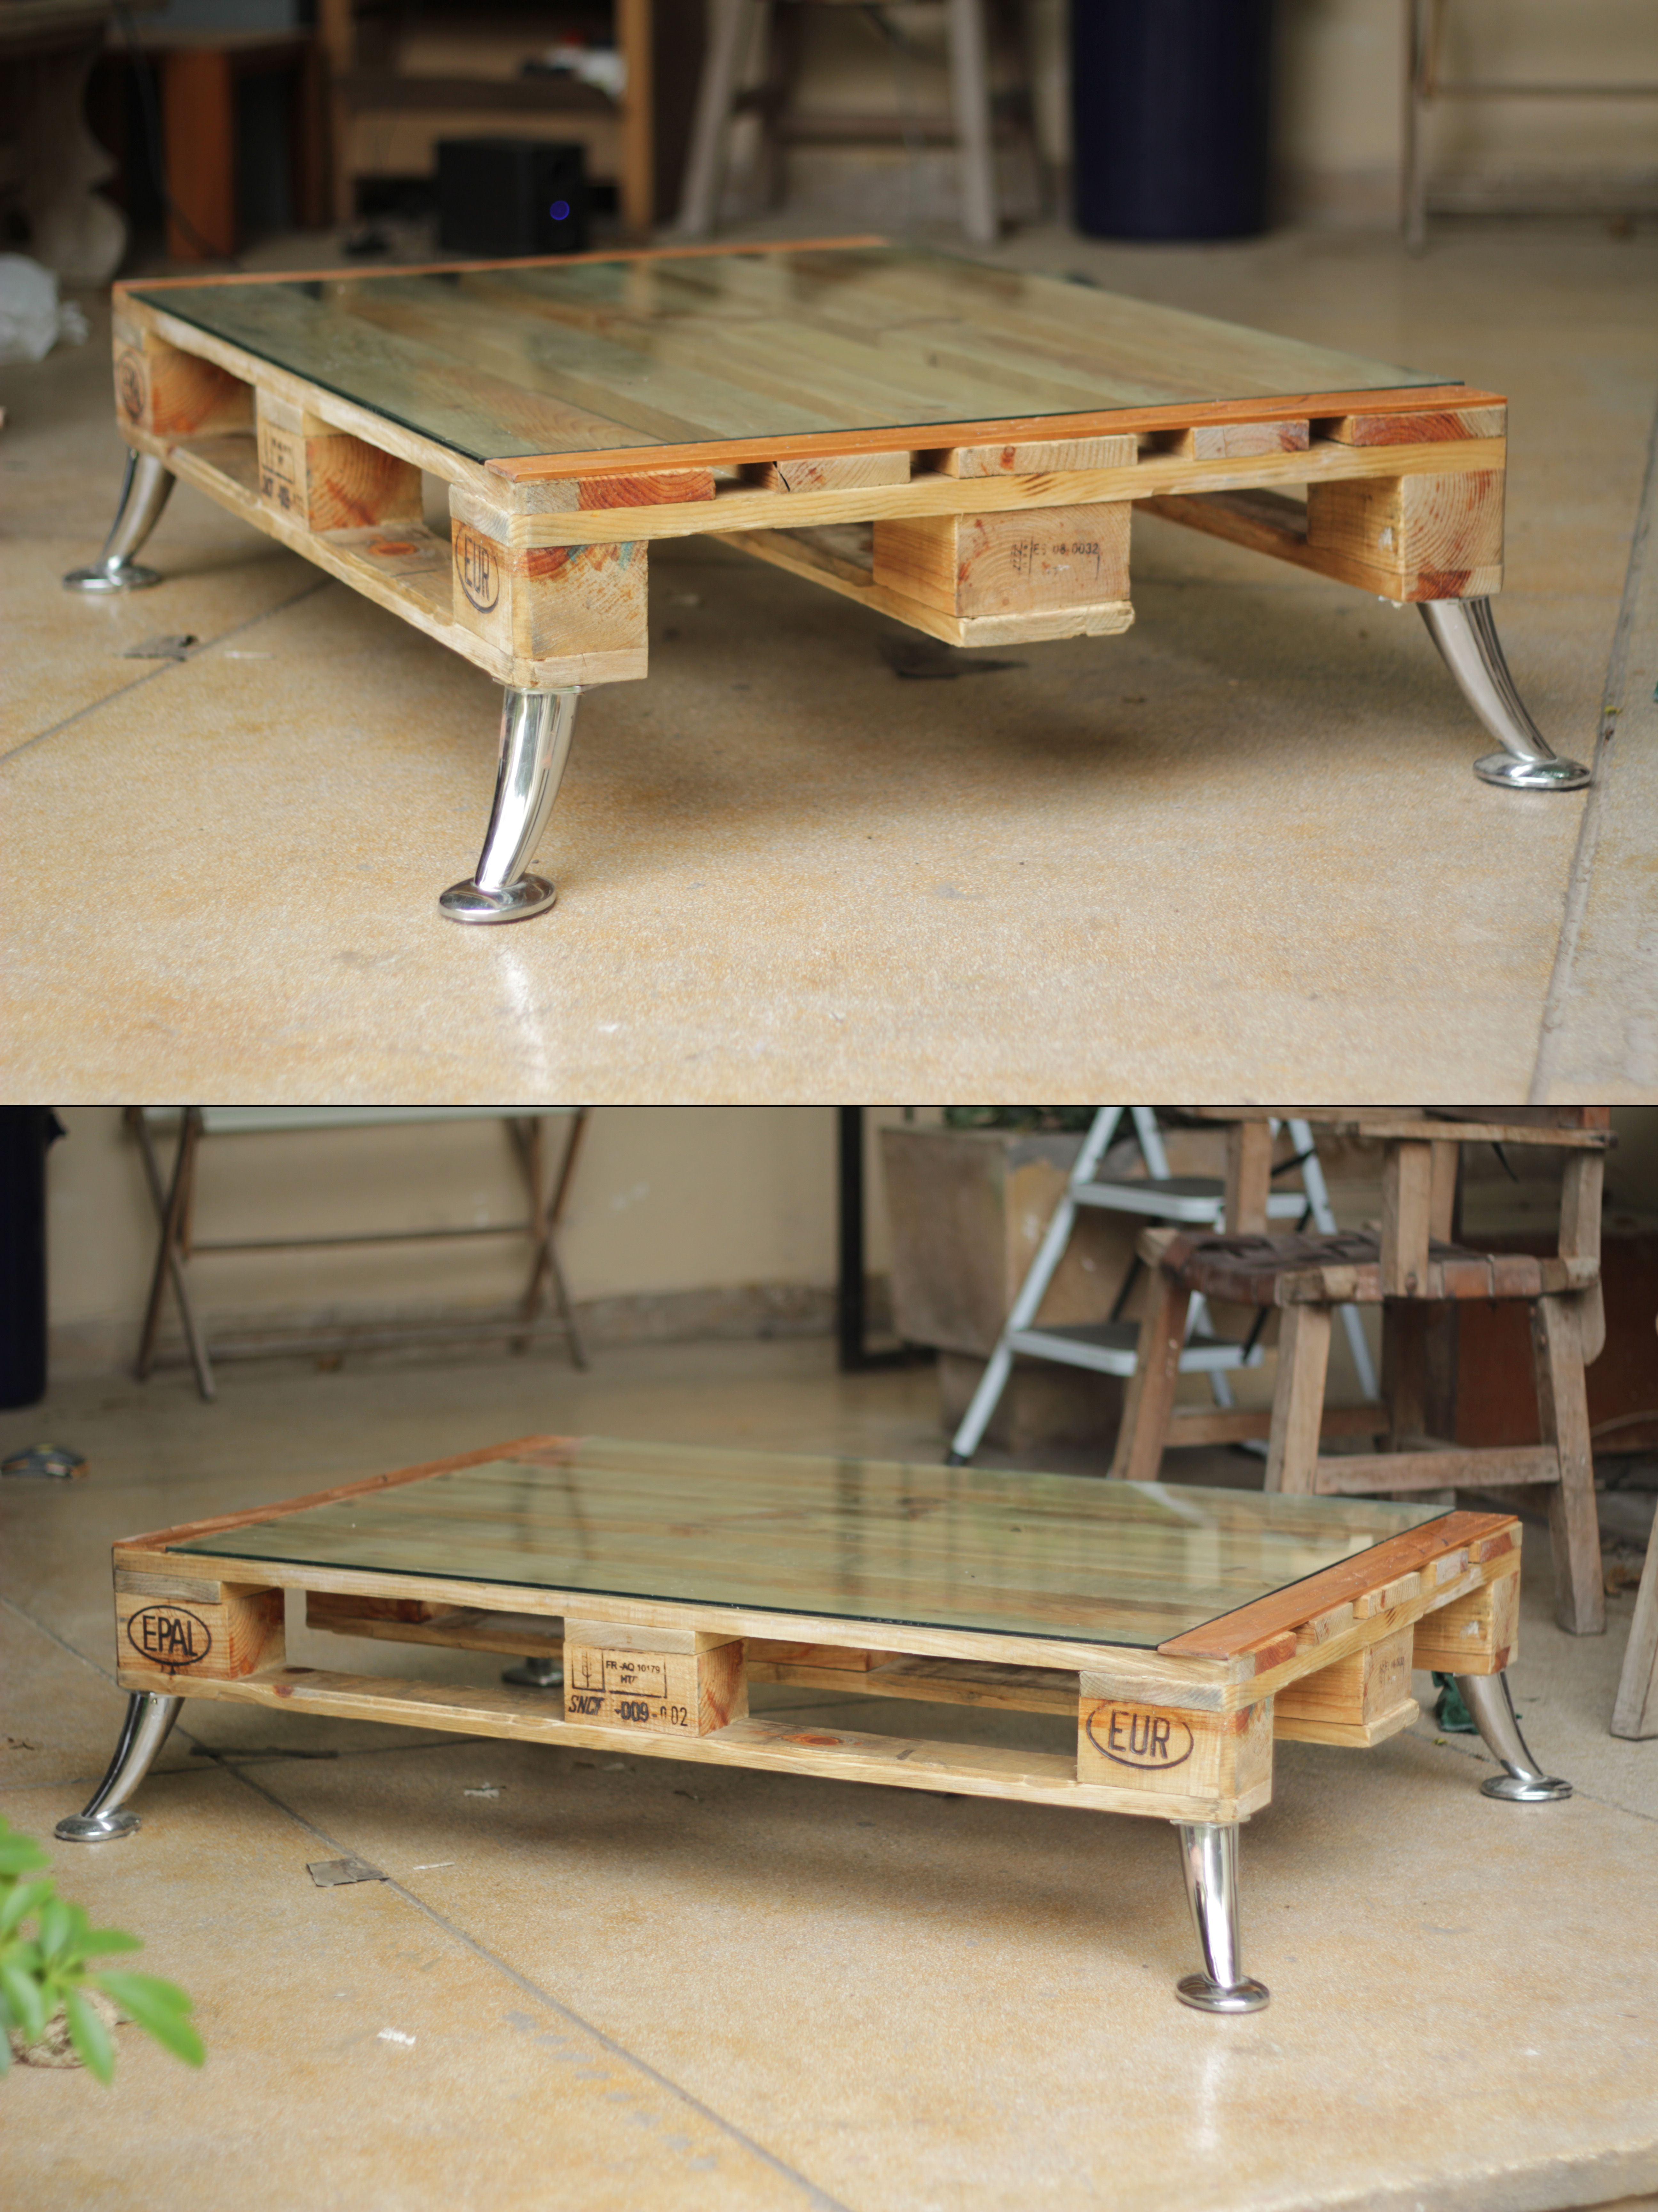 4dfeb0f157c8700bbdc3142a65b8cffd Luxe De Table Tres Basse Conception